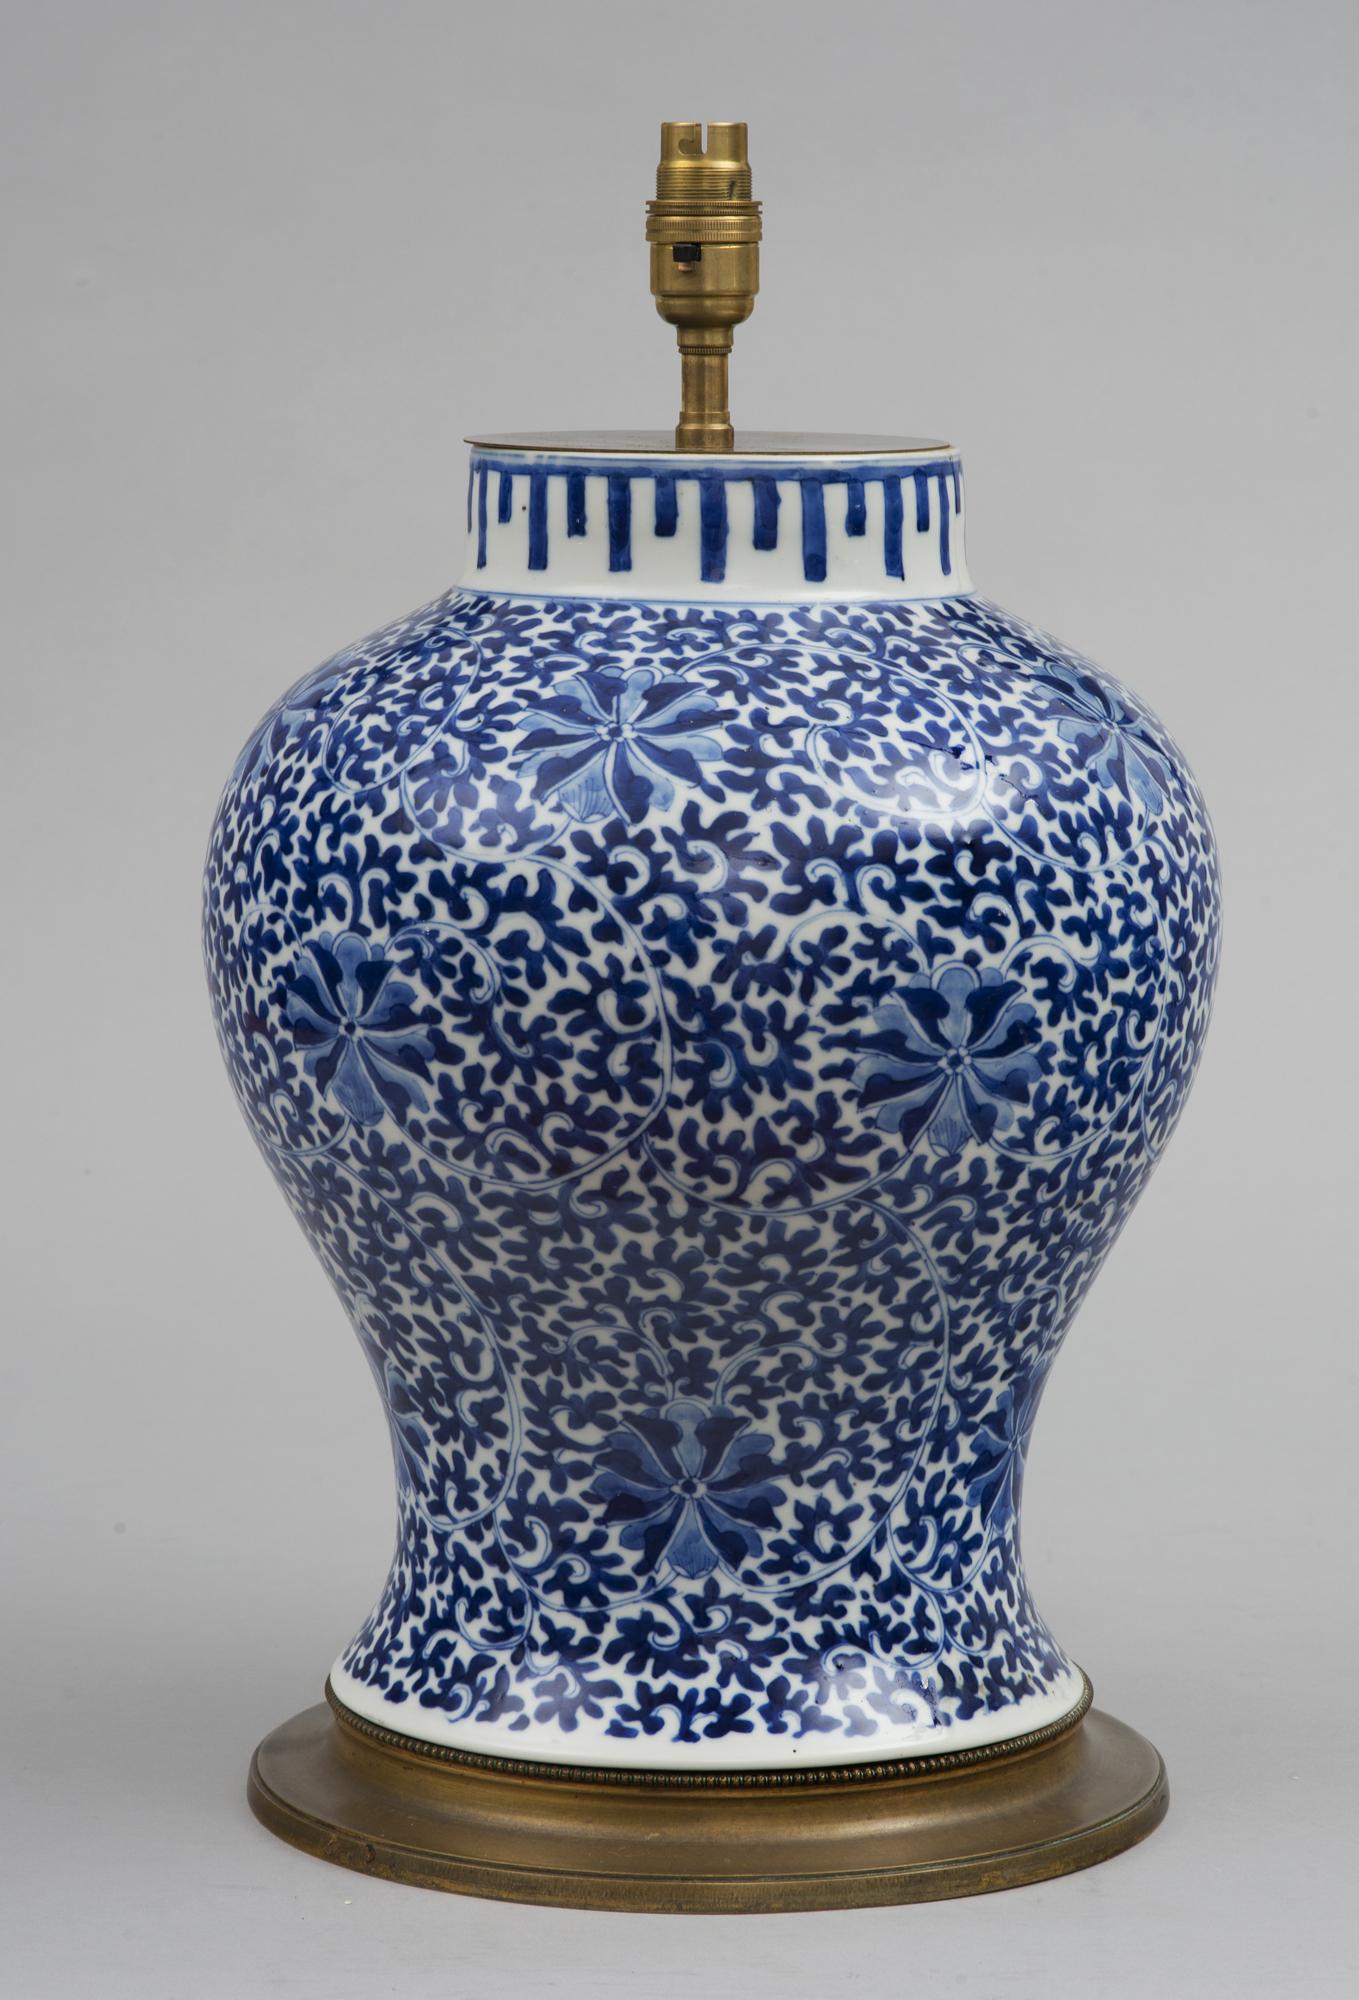 Chinese Blue Amp White Porcelain Vase Lamp Circa 1880